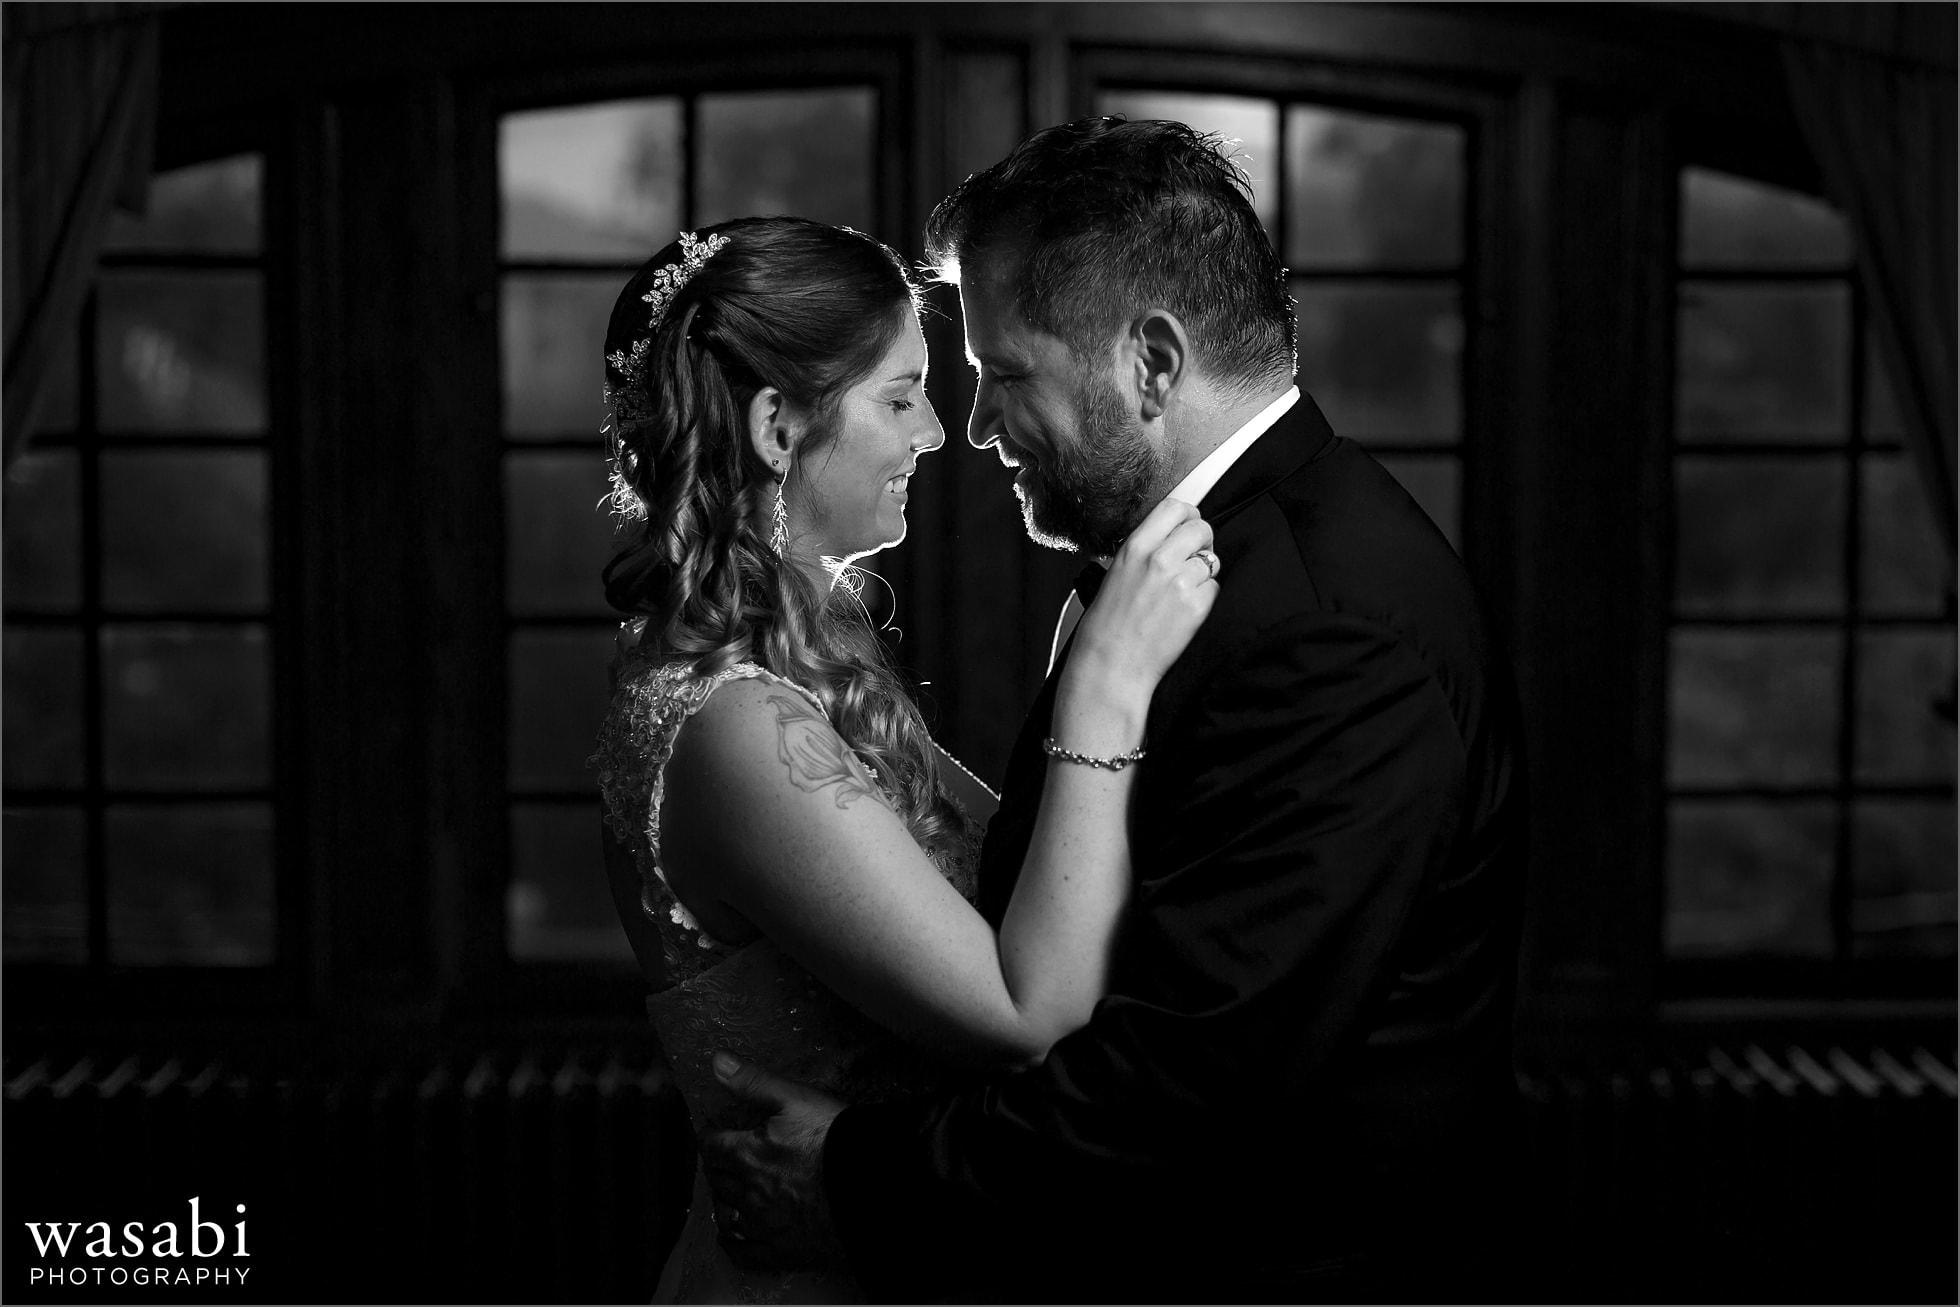 backlit black and white wedding portrait at Cheney Mansion in Oak Park